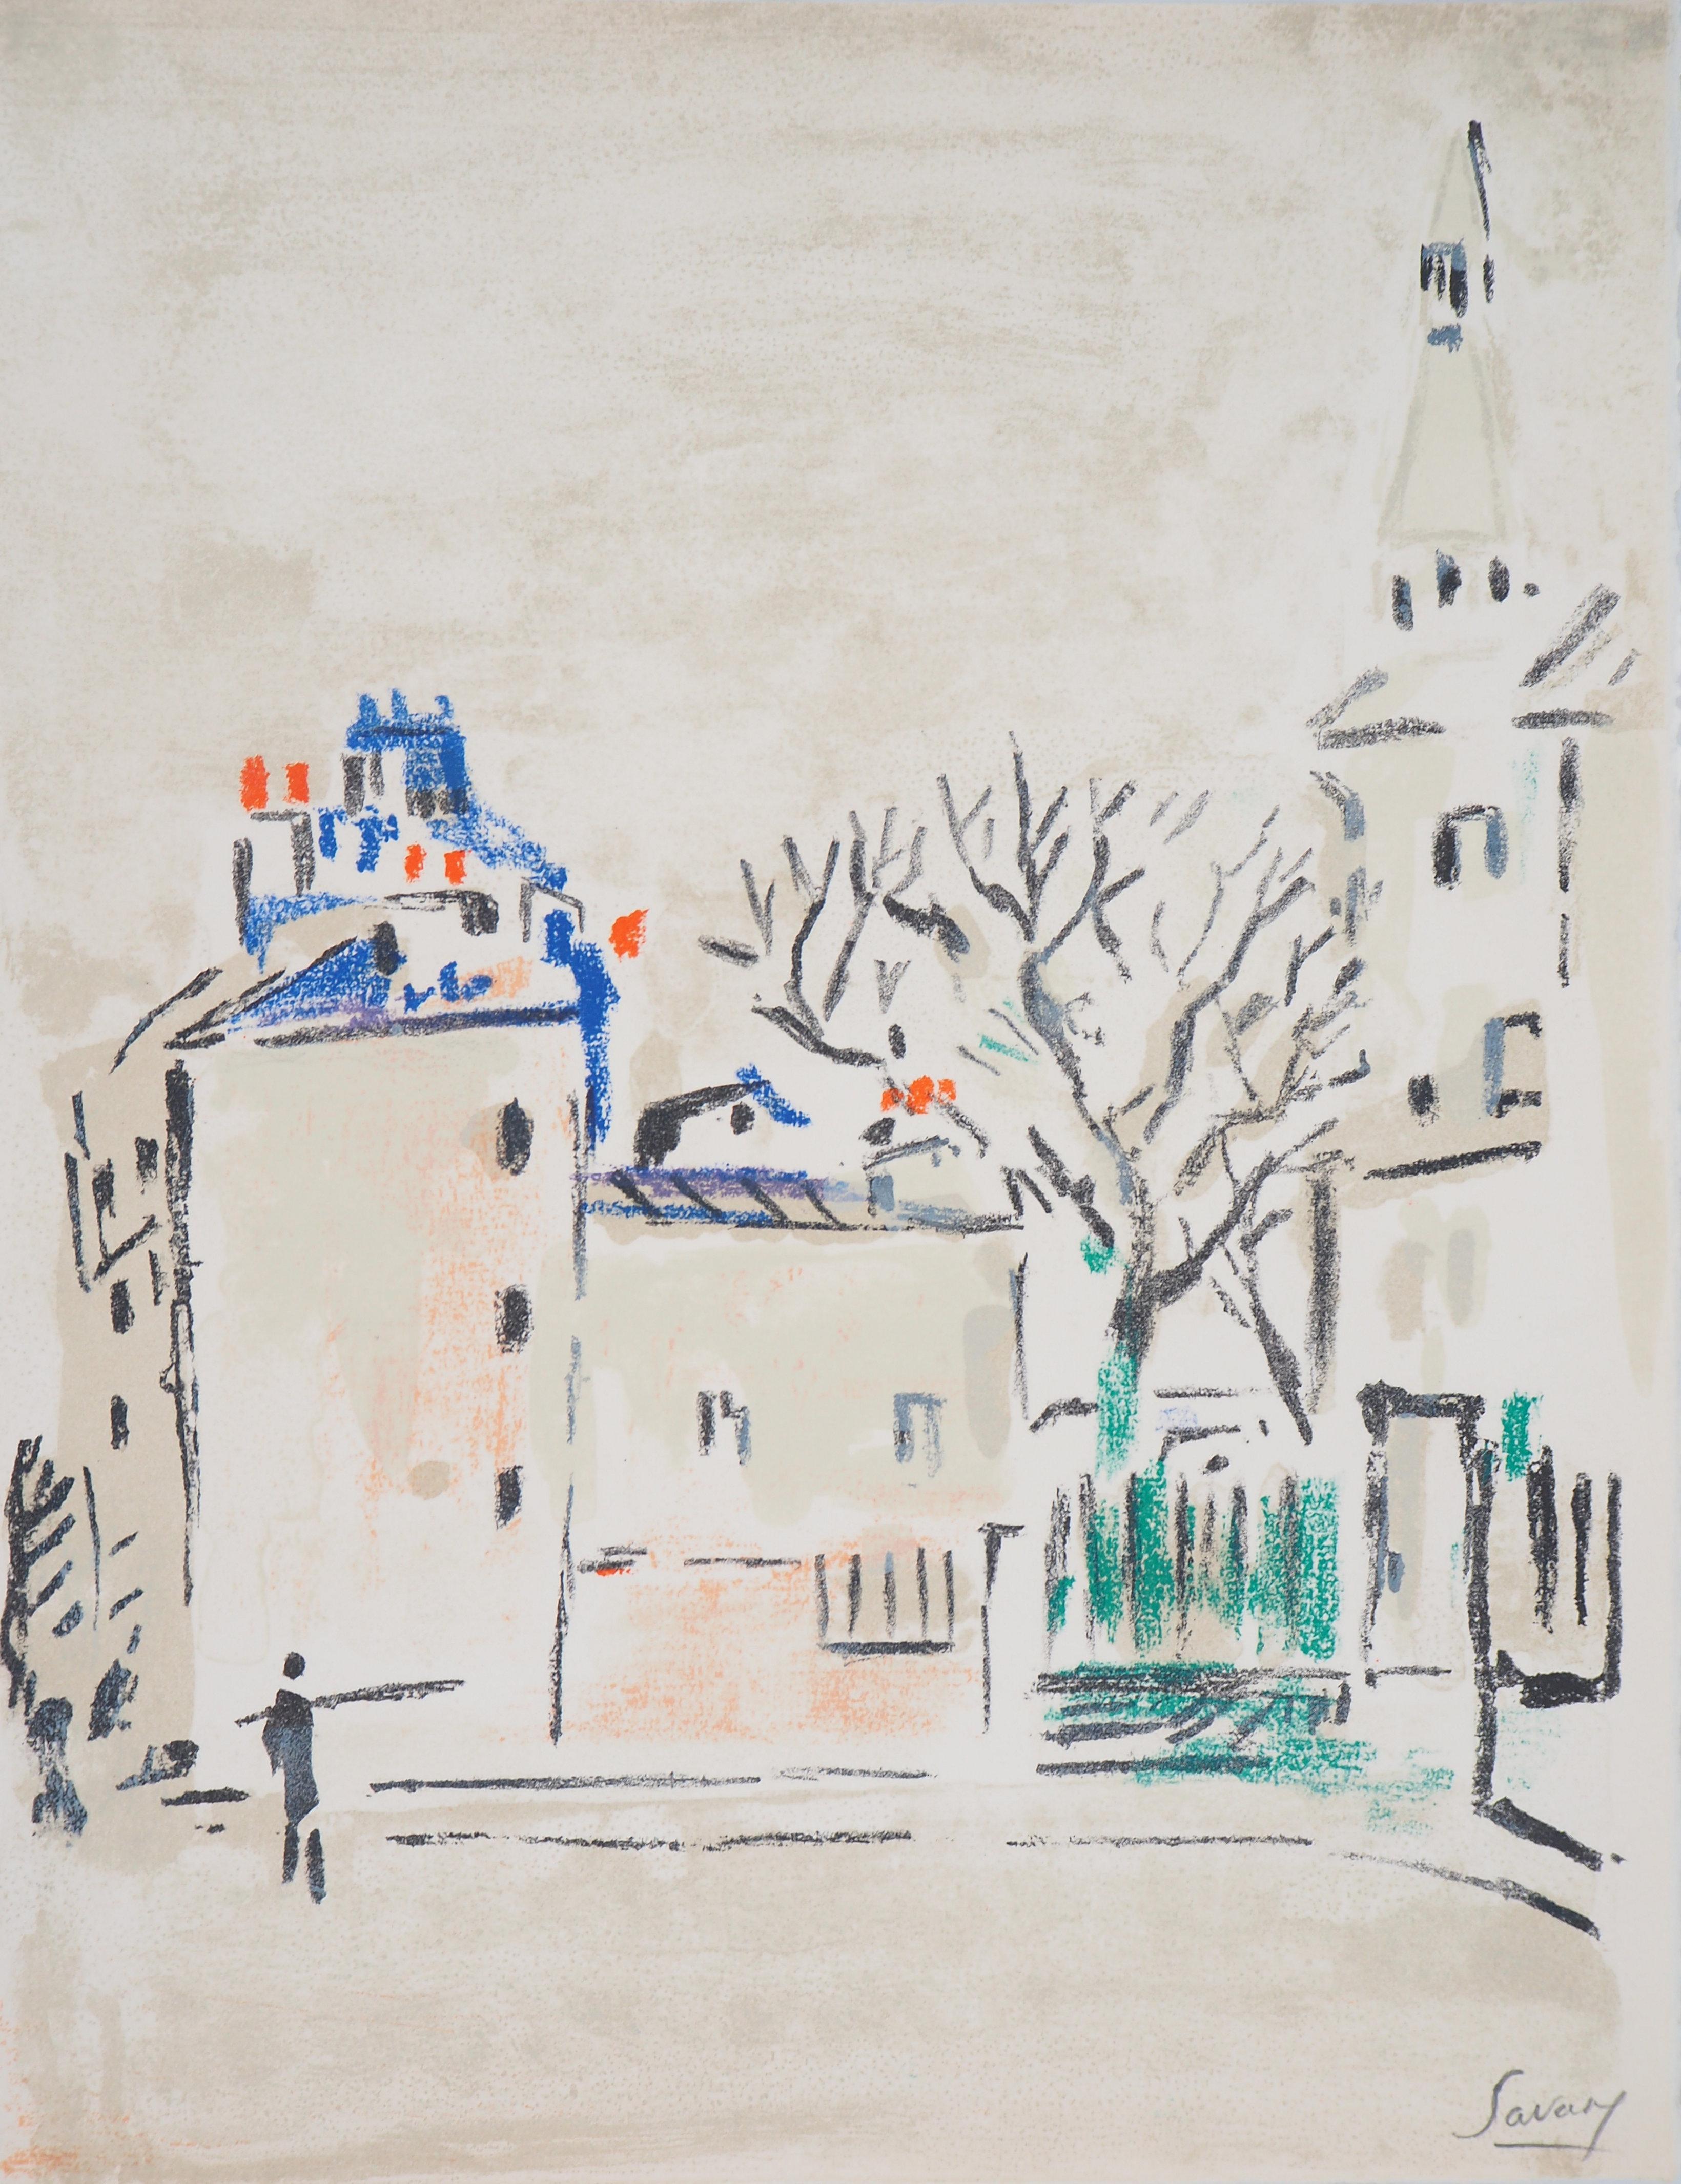 Paris : Small Square in Montmartre - Original Lithograph, Handsigned